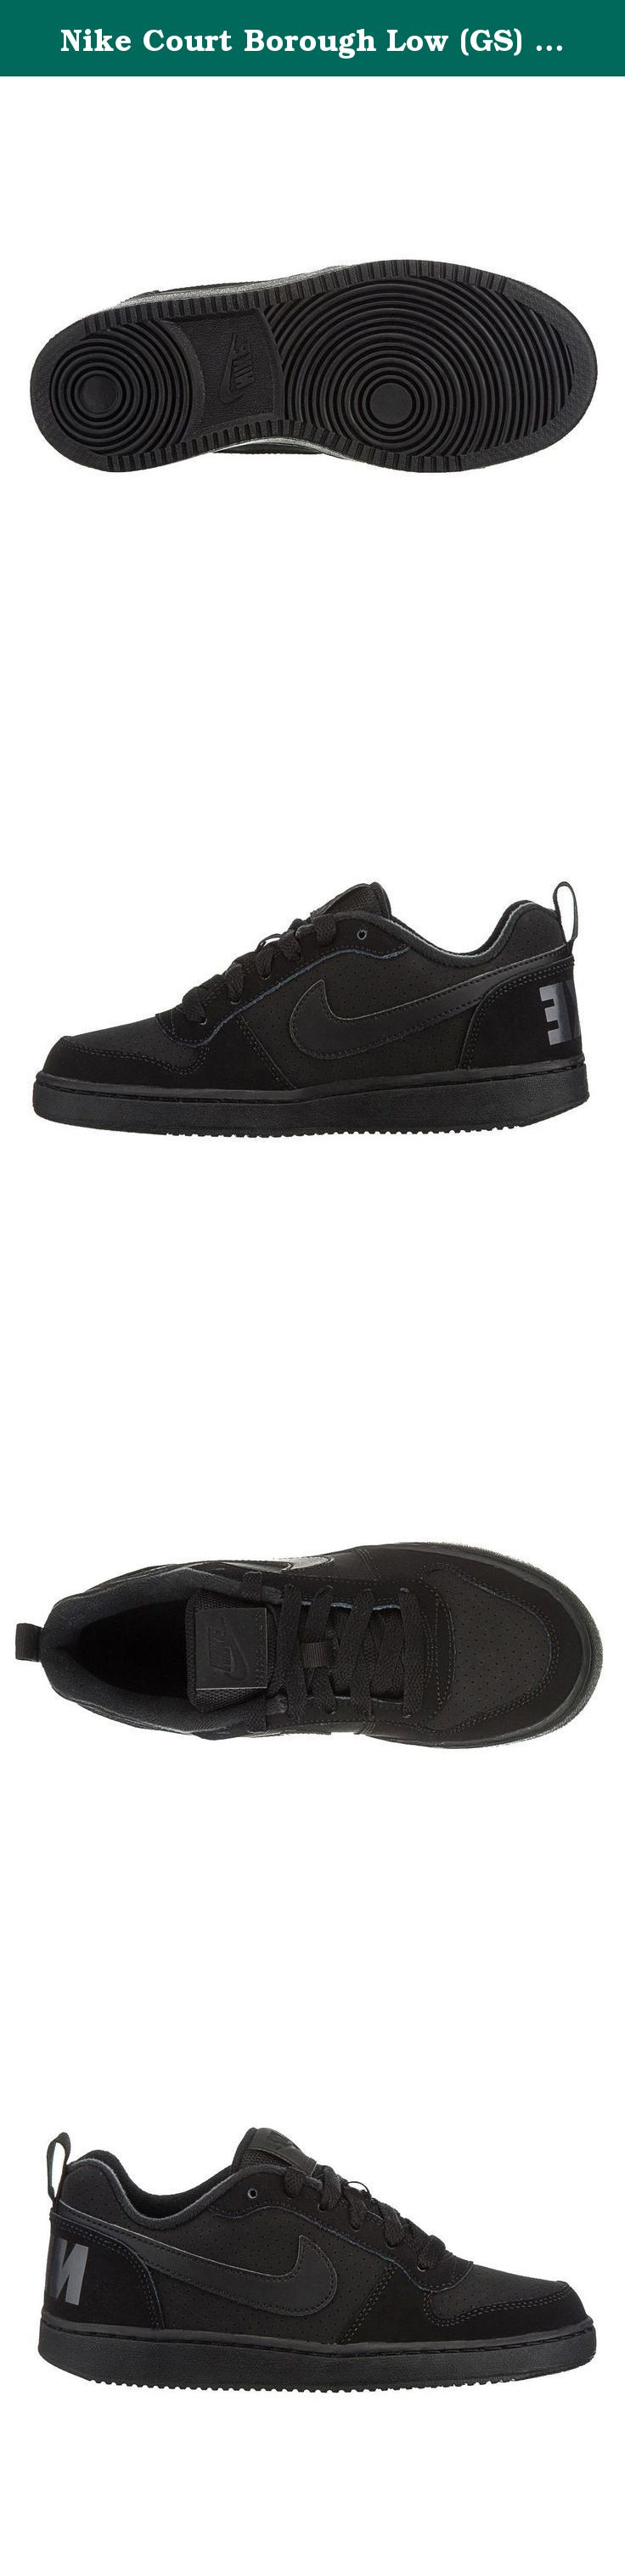 Nike Court Borough Low (GS) Grade School Shoes BlackBlack